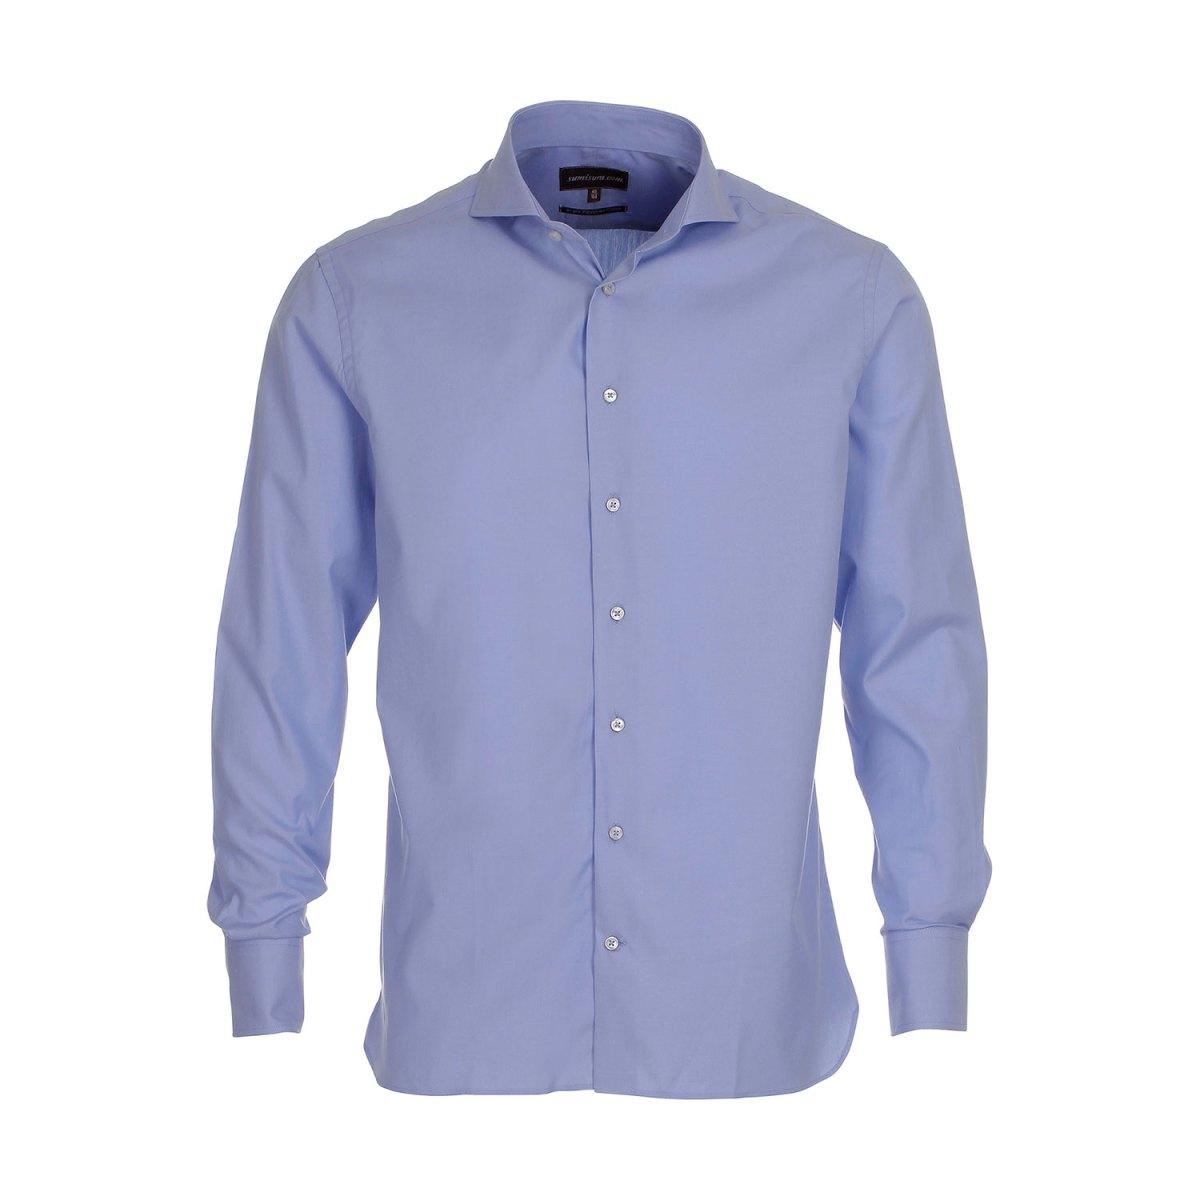 Sumisura Maine Lyseblå Skjorte